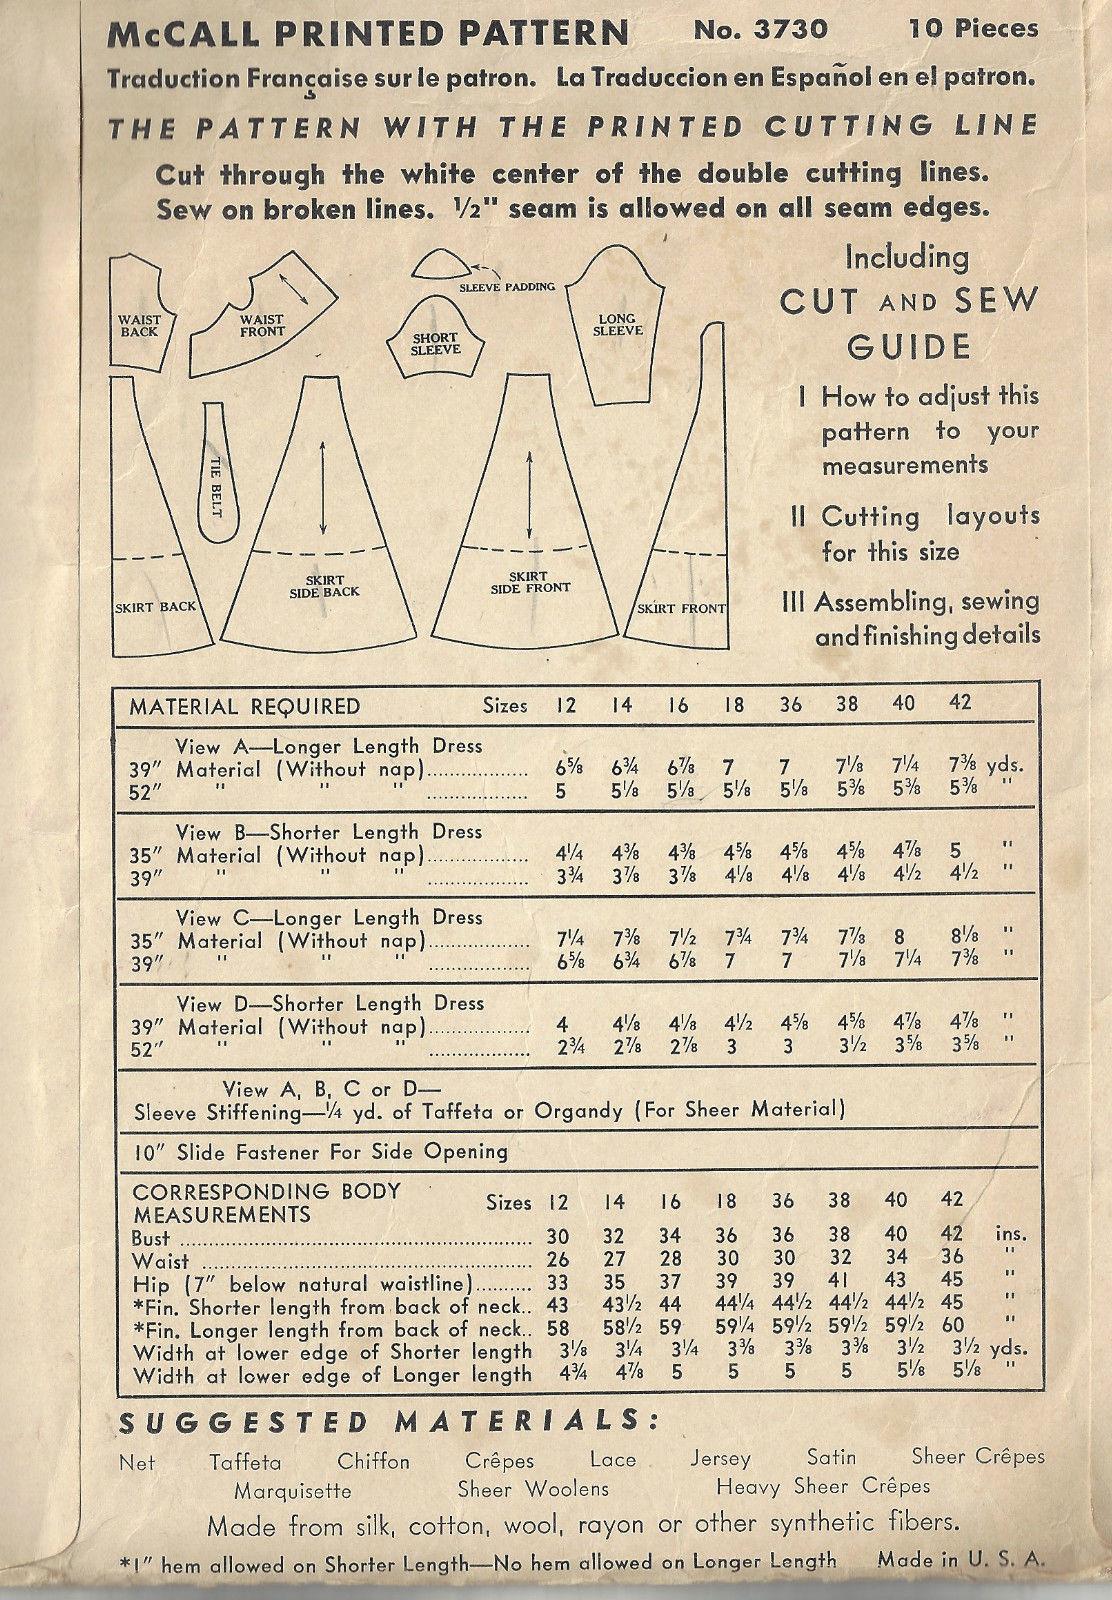 1940 Ww2 Vintage Sewing Pattern B30 Dress 1663 The Vintage